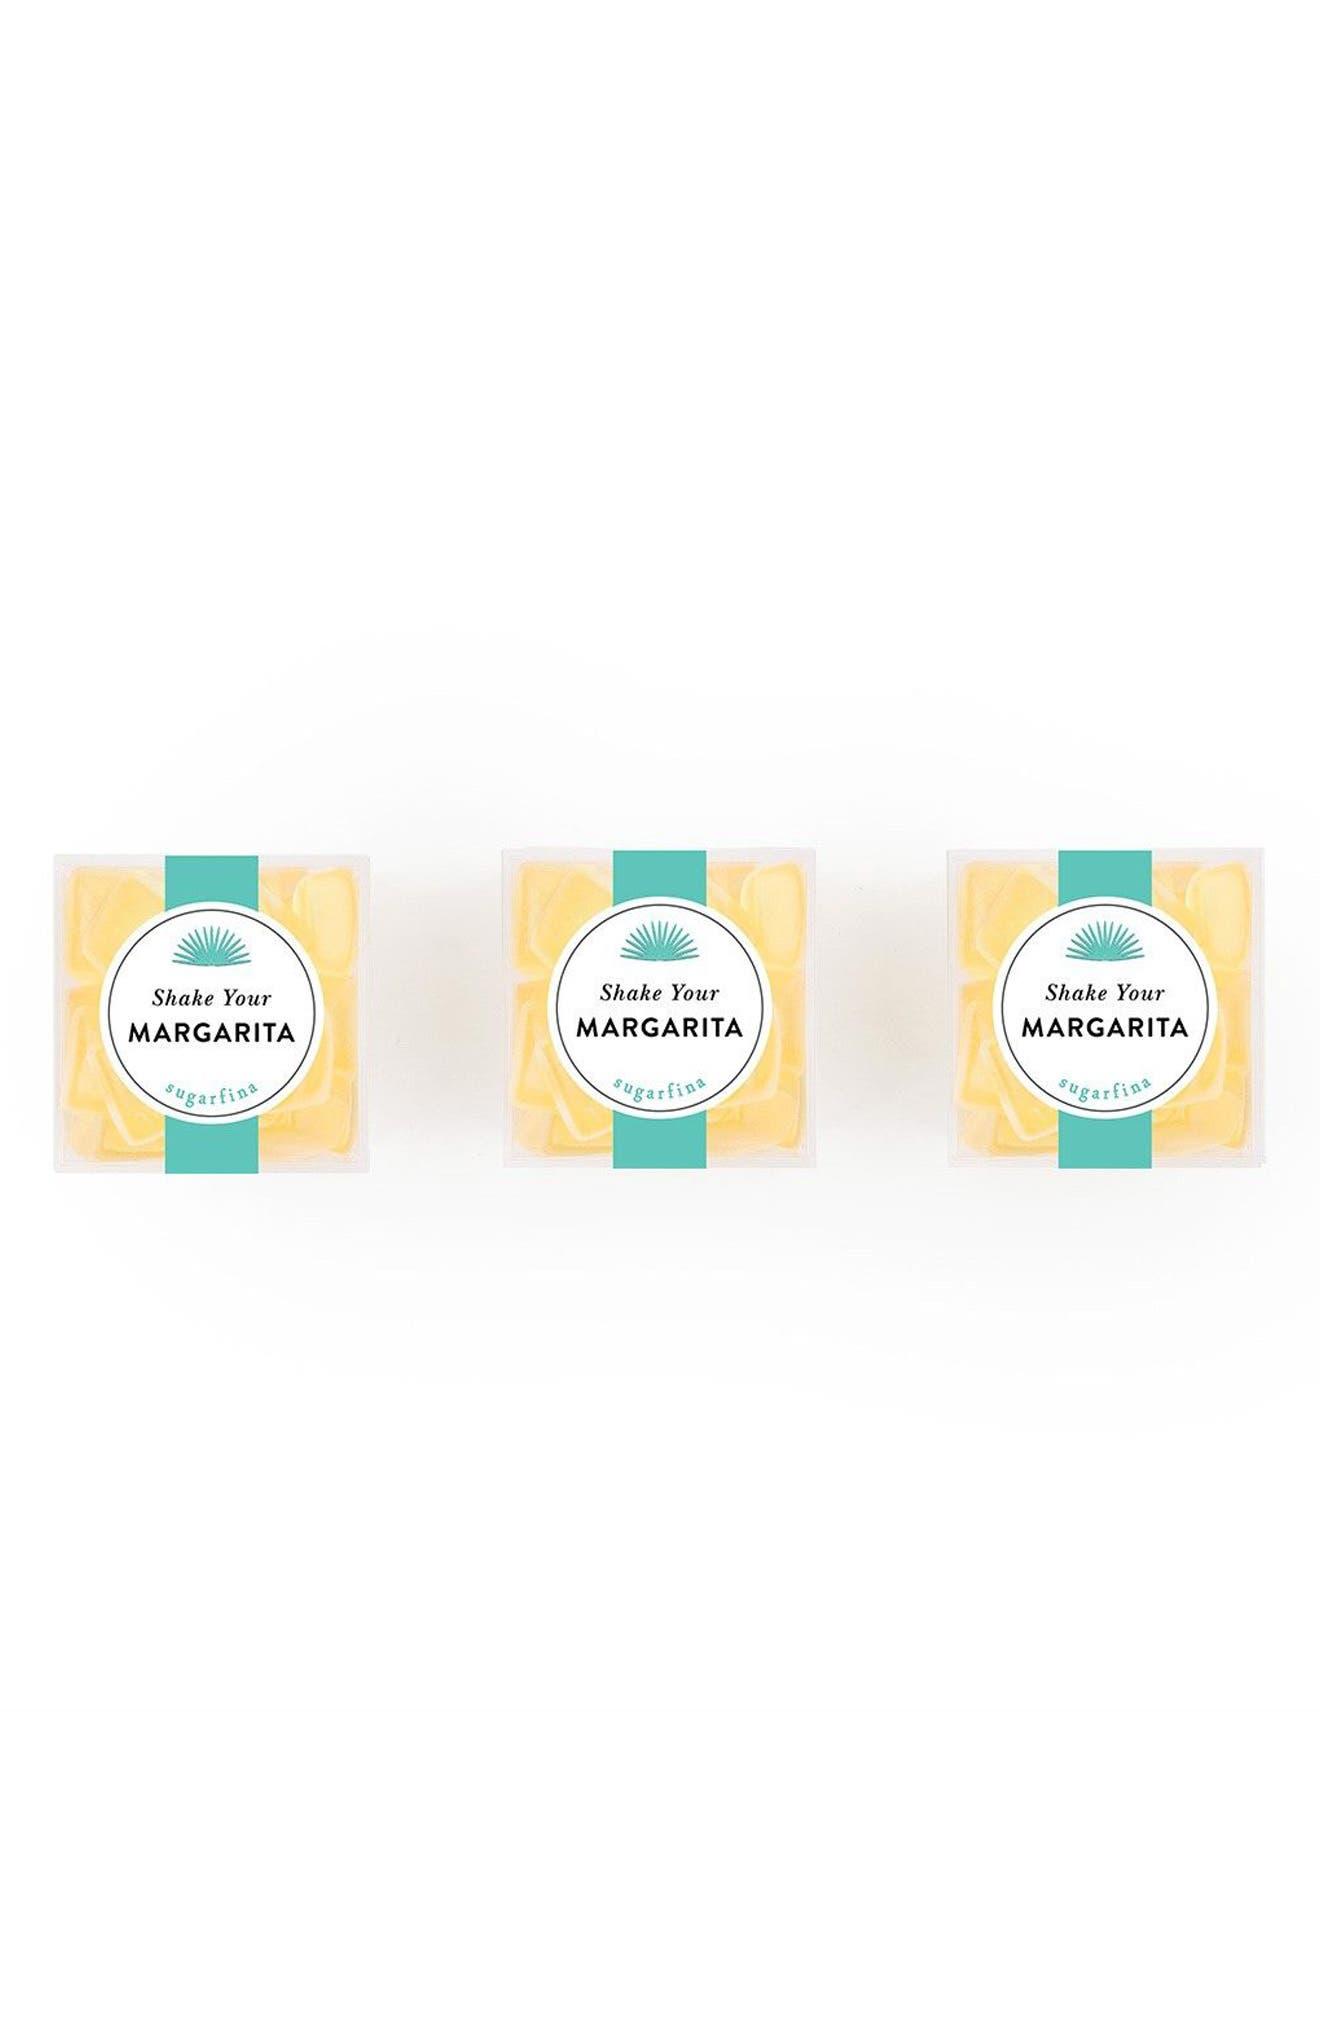 Main Image - sugarfina Casamigos - Shake Your Margarita Tequila Gummy Gift Set